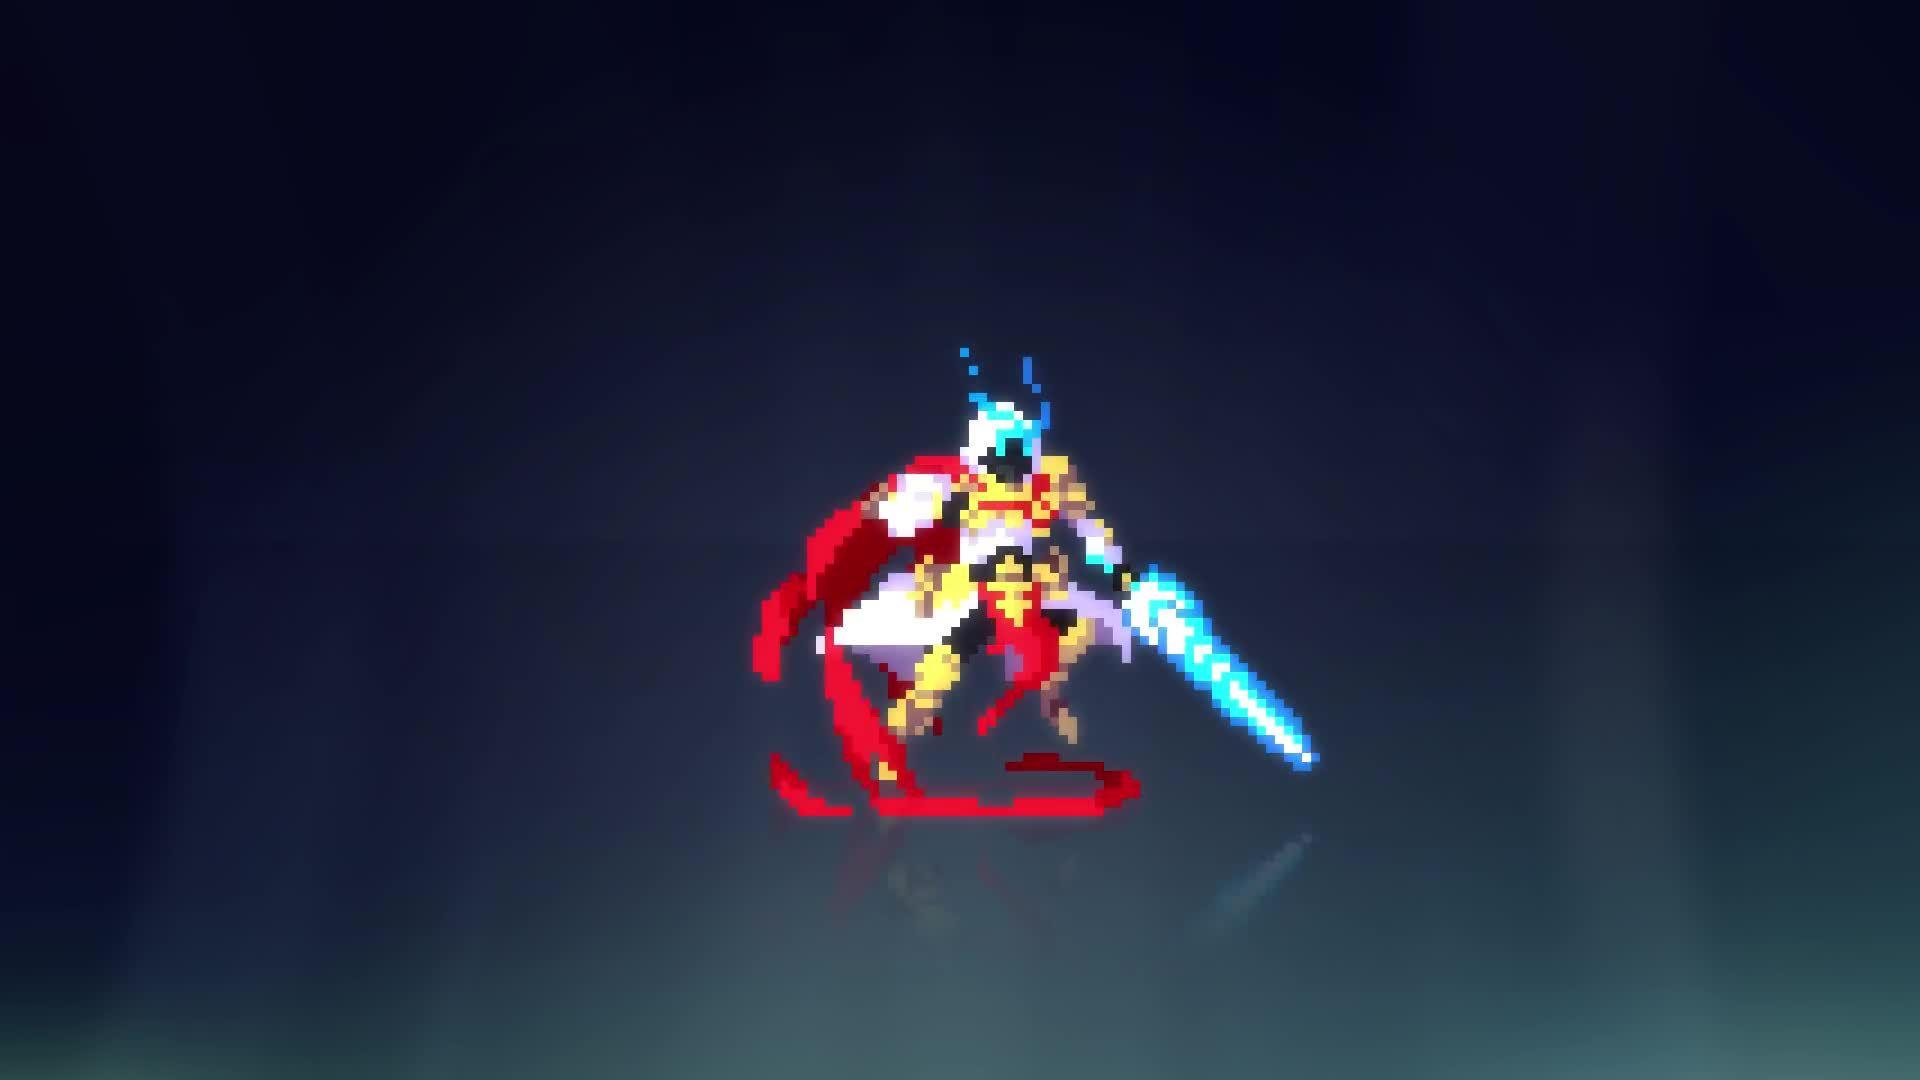 duelyst, Astral Crusader GIFs